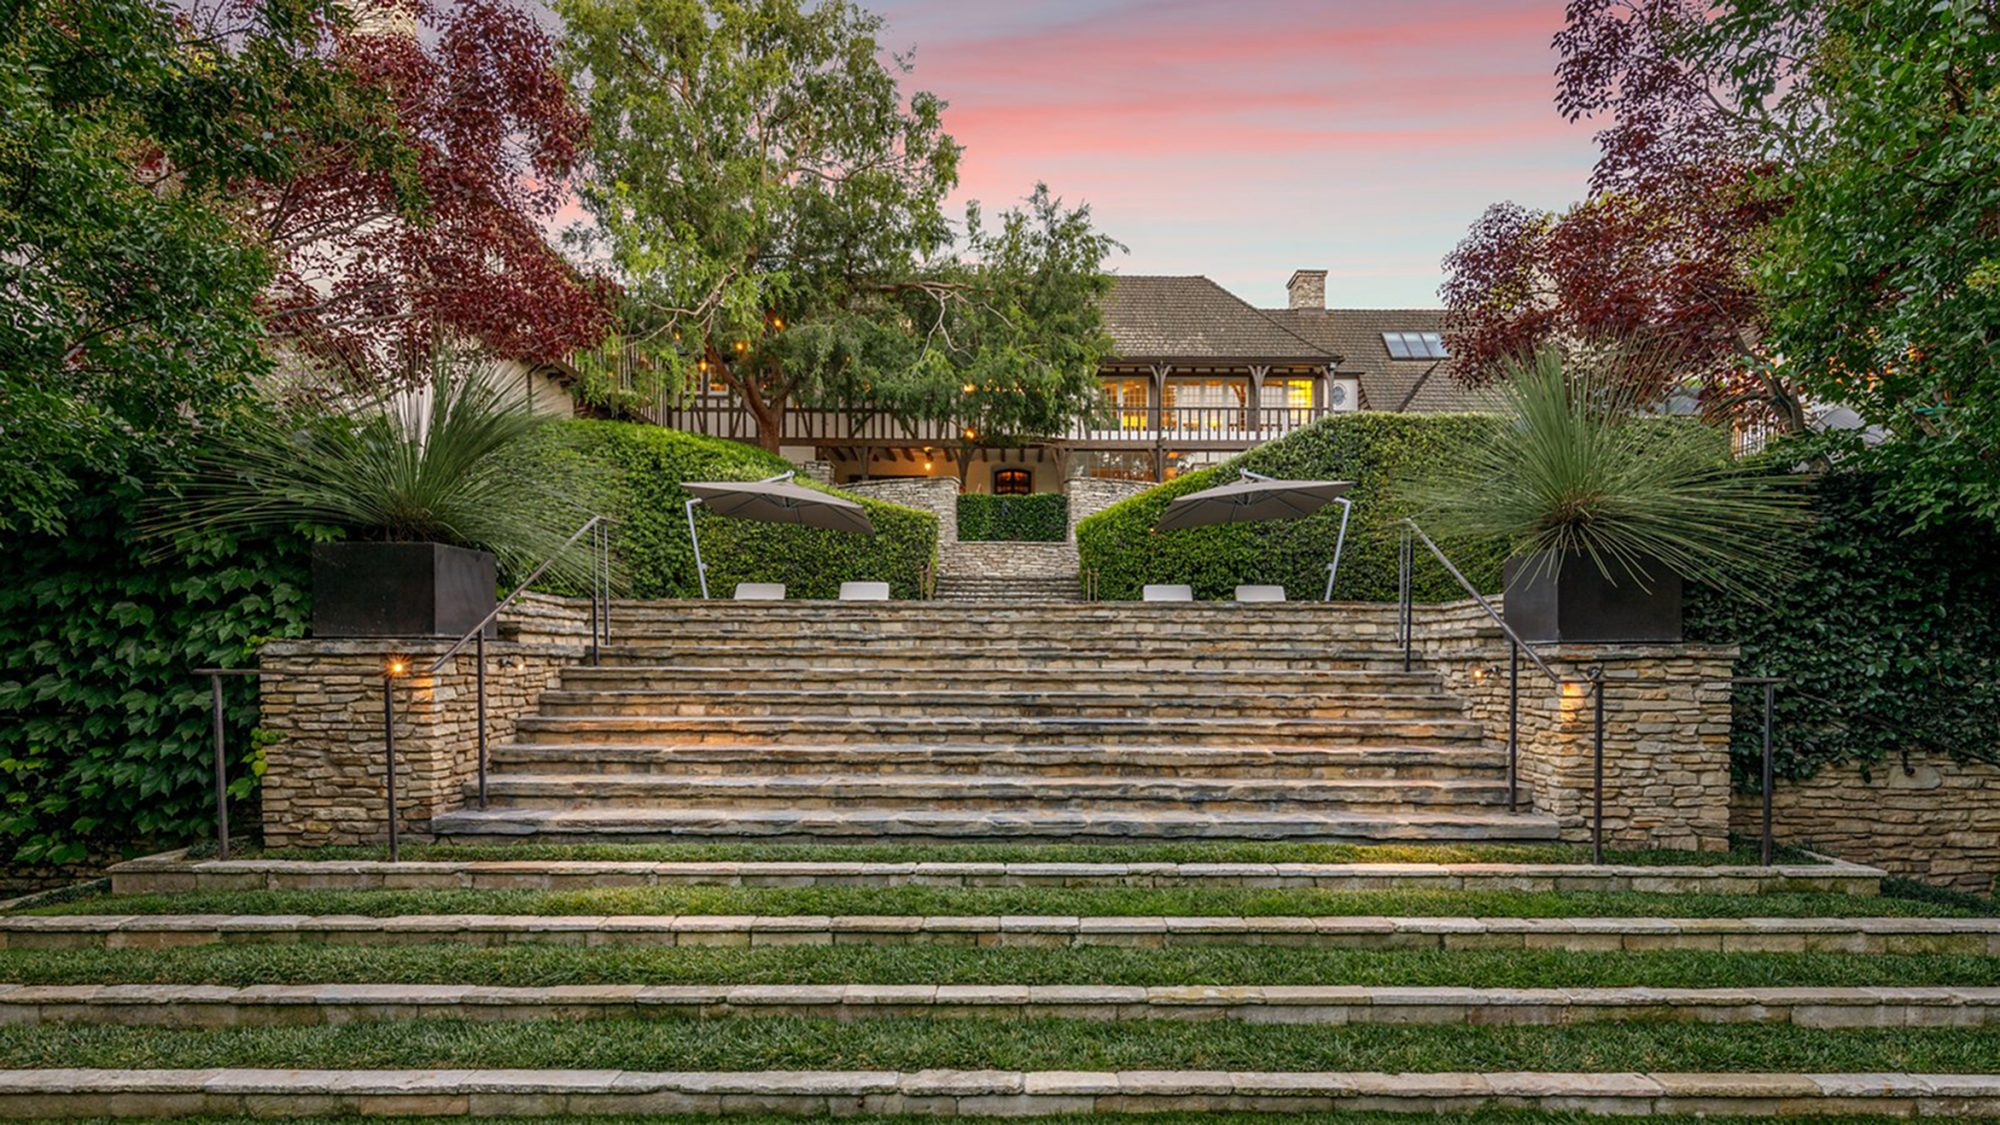 Jennifer Aniston and Brad Pitt's Former Beverly Hills Mansion